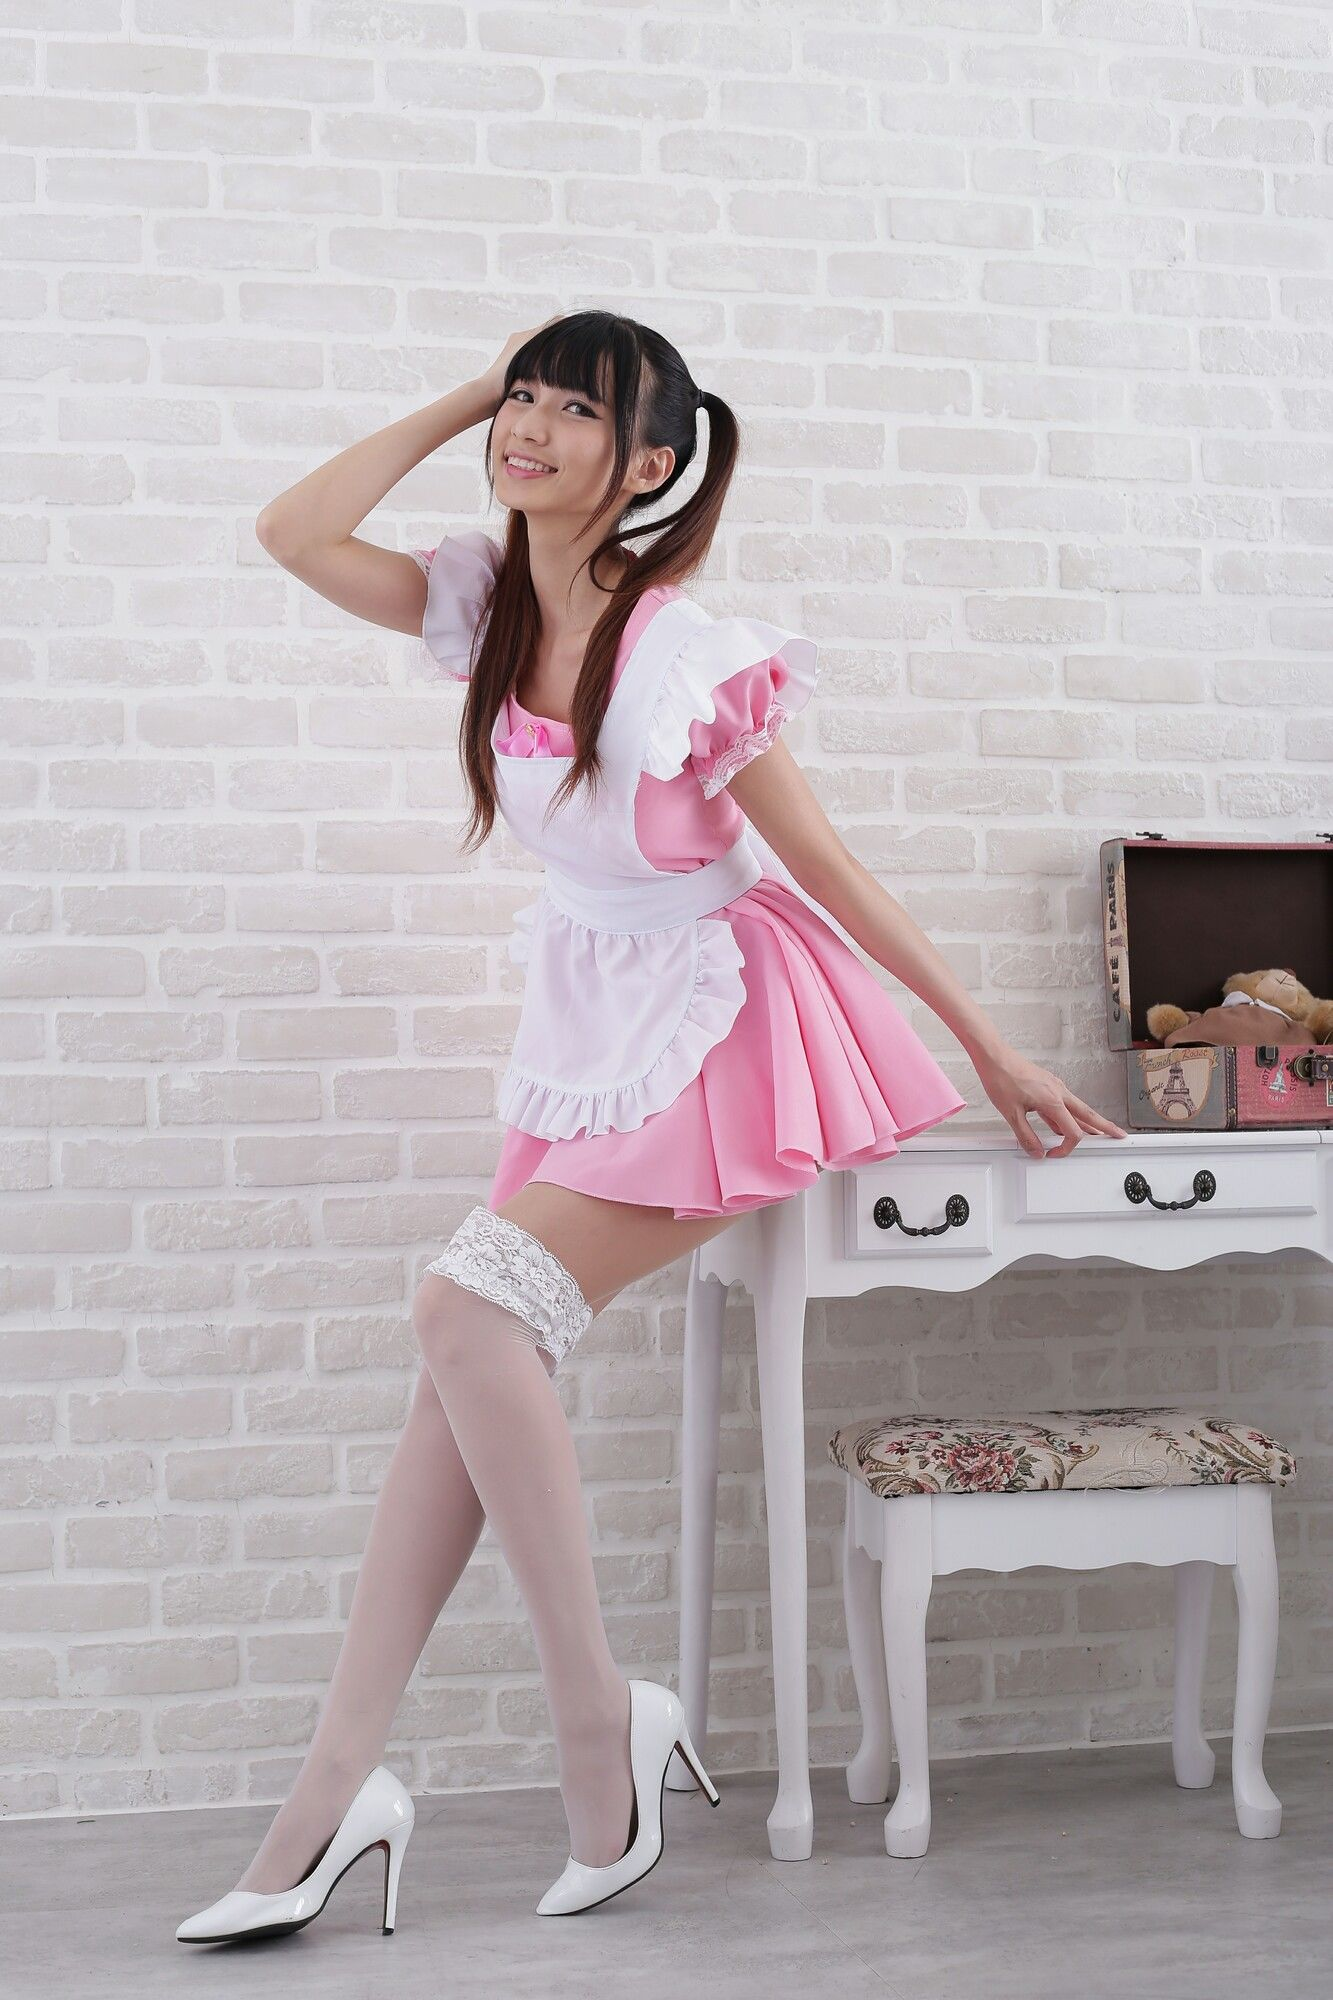 VOL.629 [台湾正妹]可爱女仆白丝:蔡译心(Candice)超高清个人性感漂亮大图(57P)